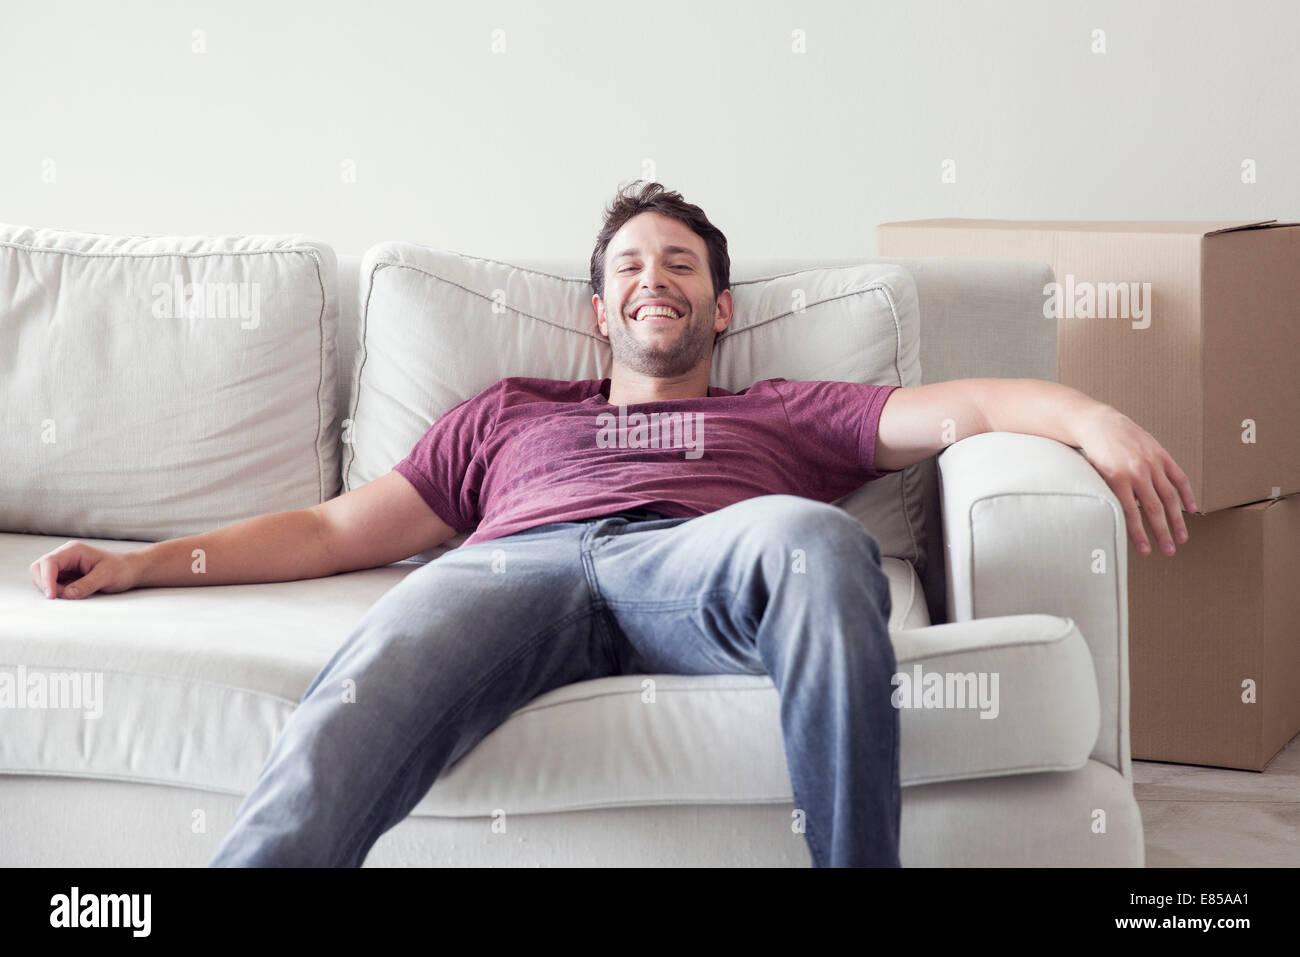 Man relaxing on sofa alors que d'un déménagement Photo Stock